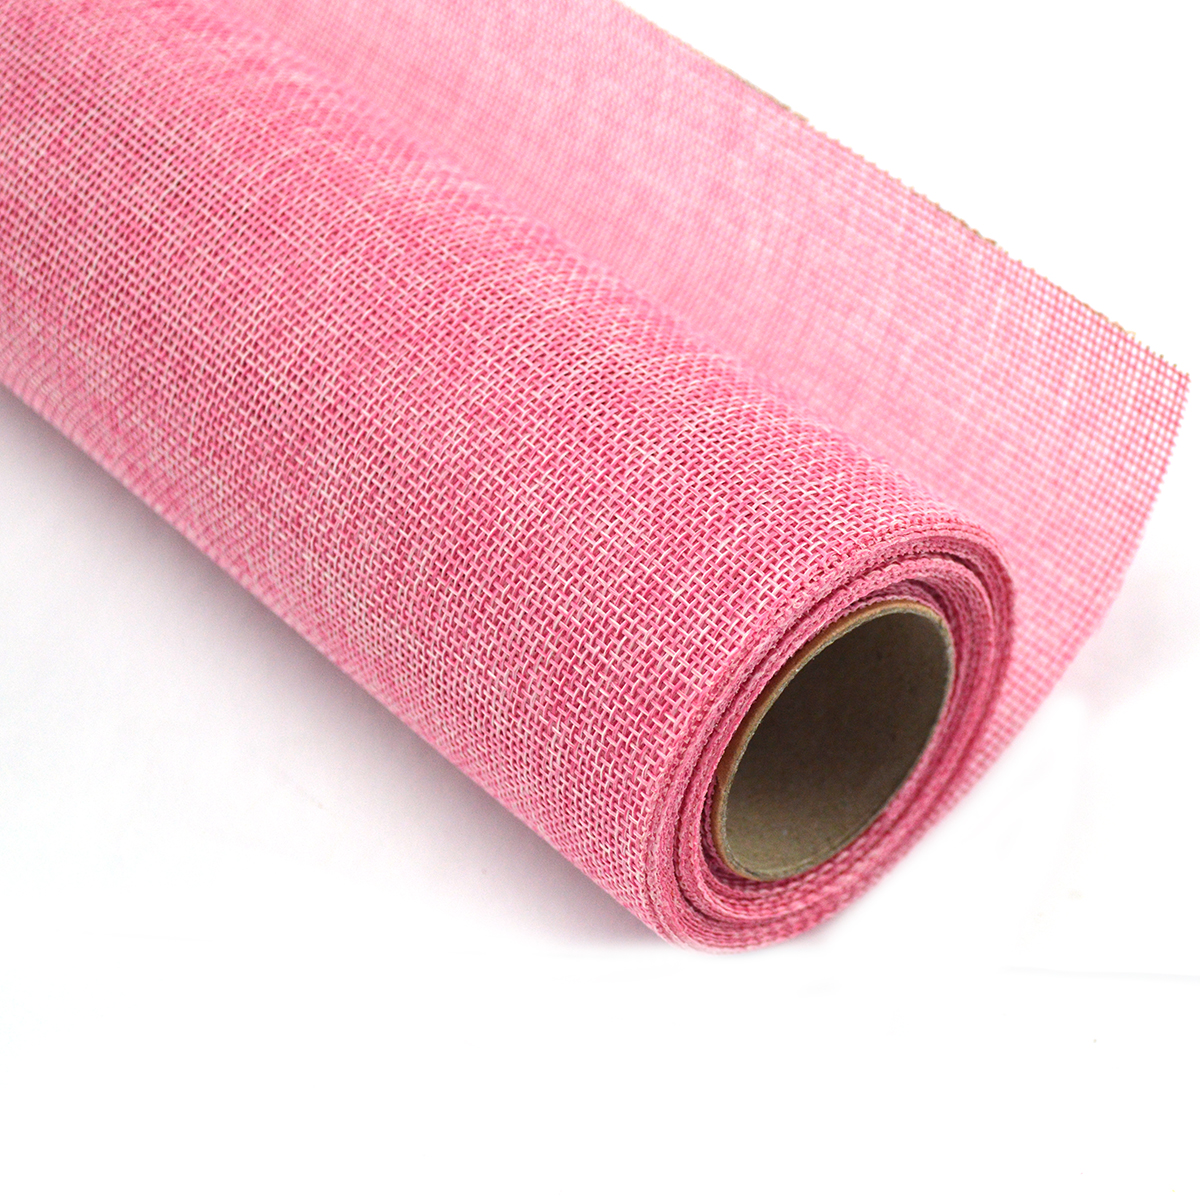 Plasa Sac Roz - ambalaje si accesorii florale